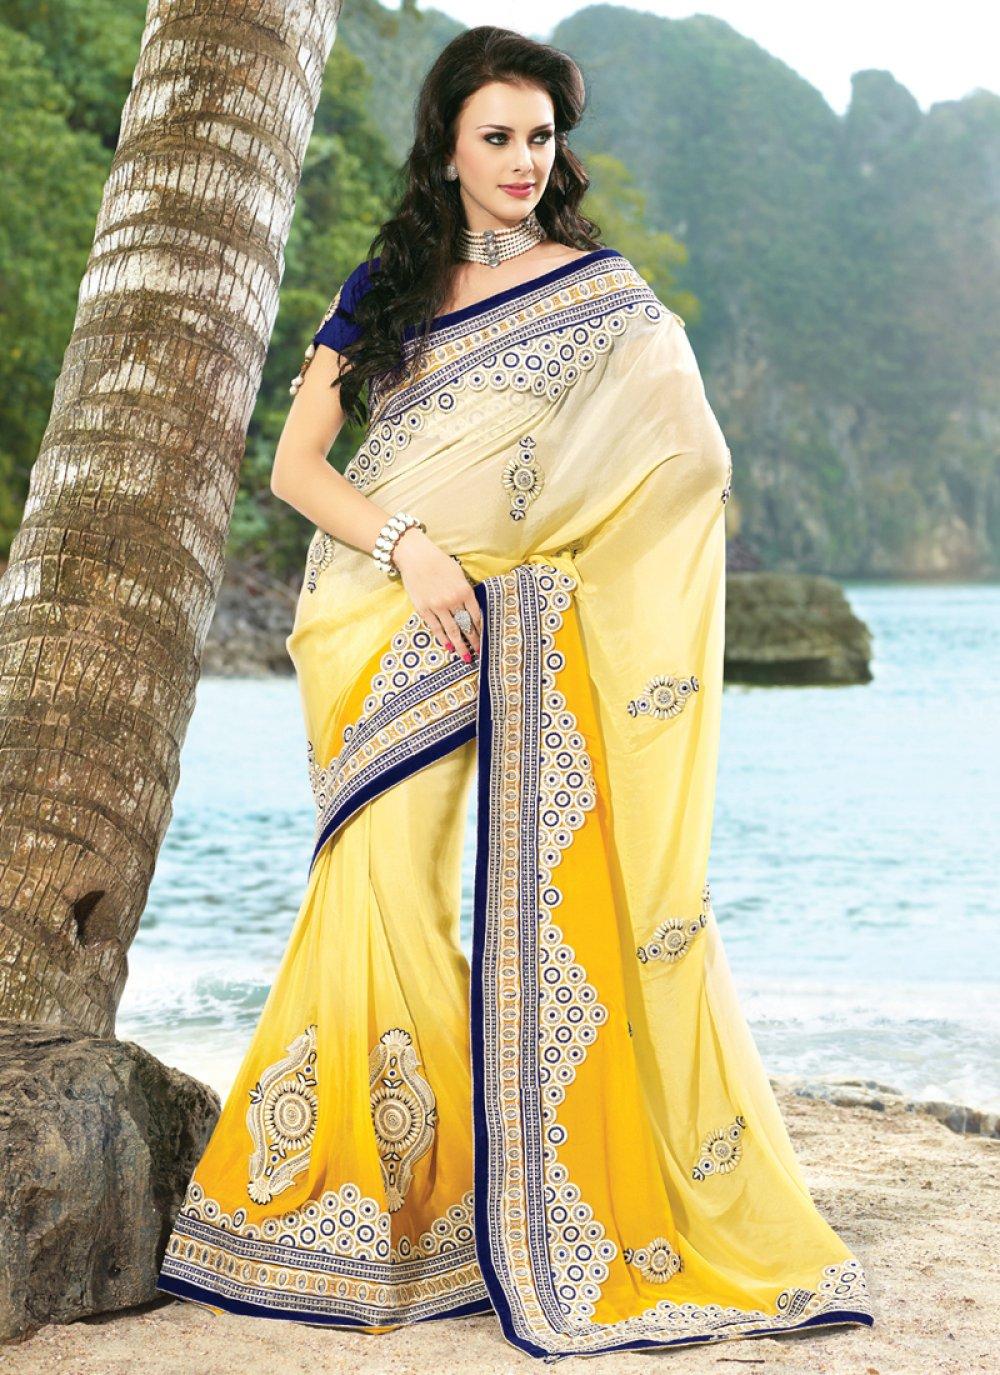 Diva Bttercream & Gold Color Embroidered Saree